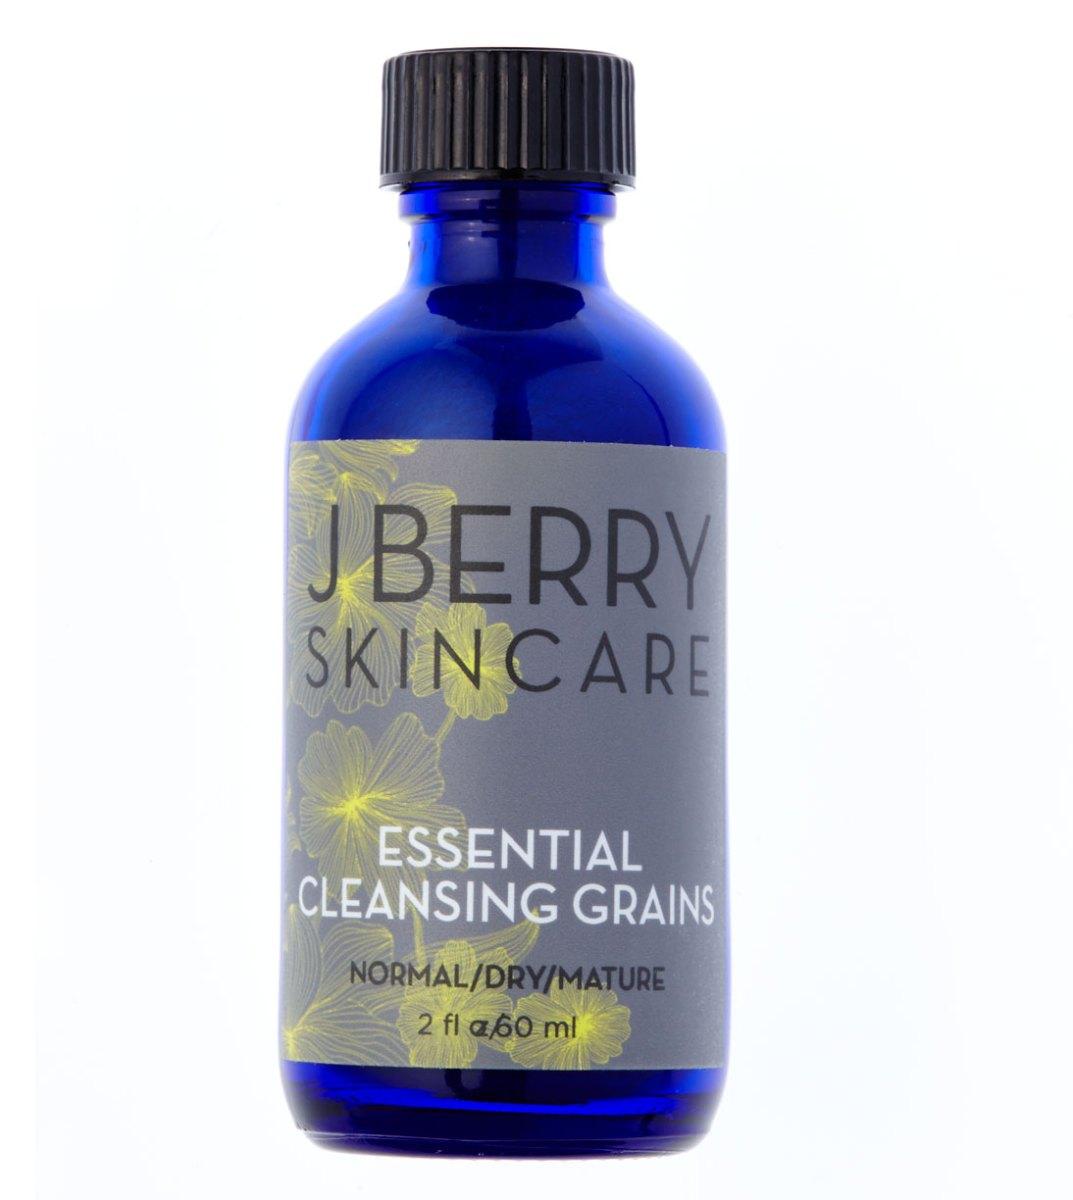 Essential Cleansing Grains